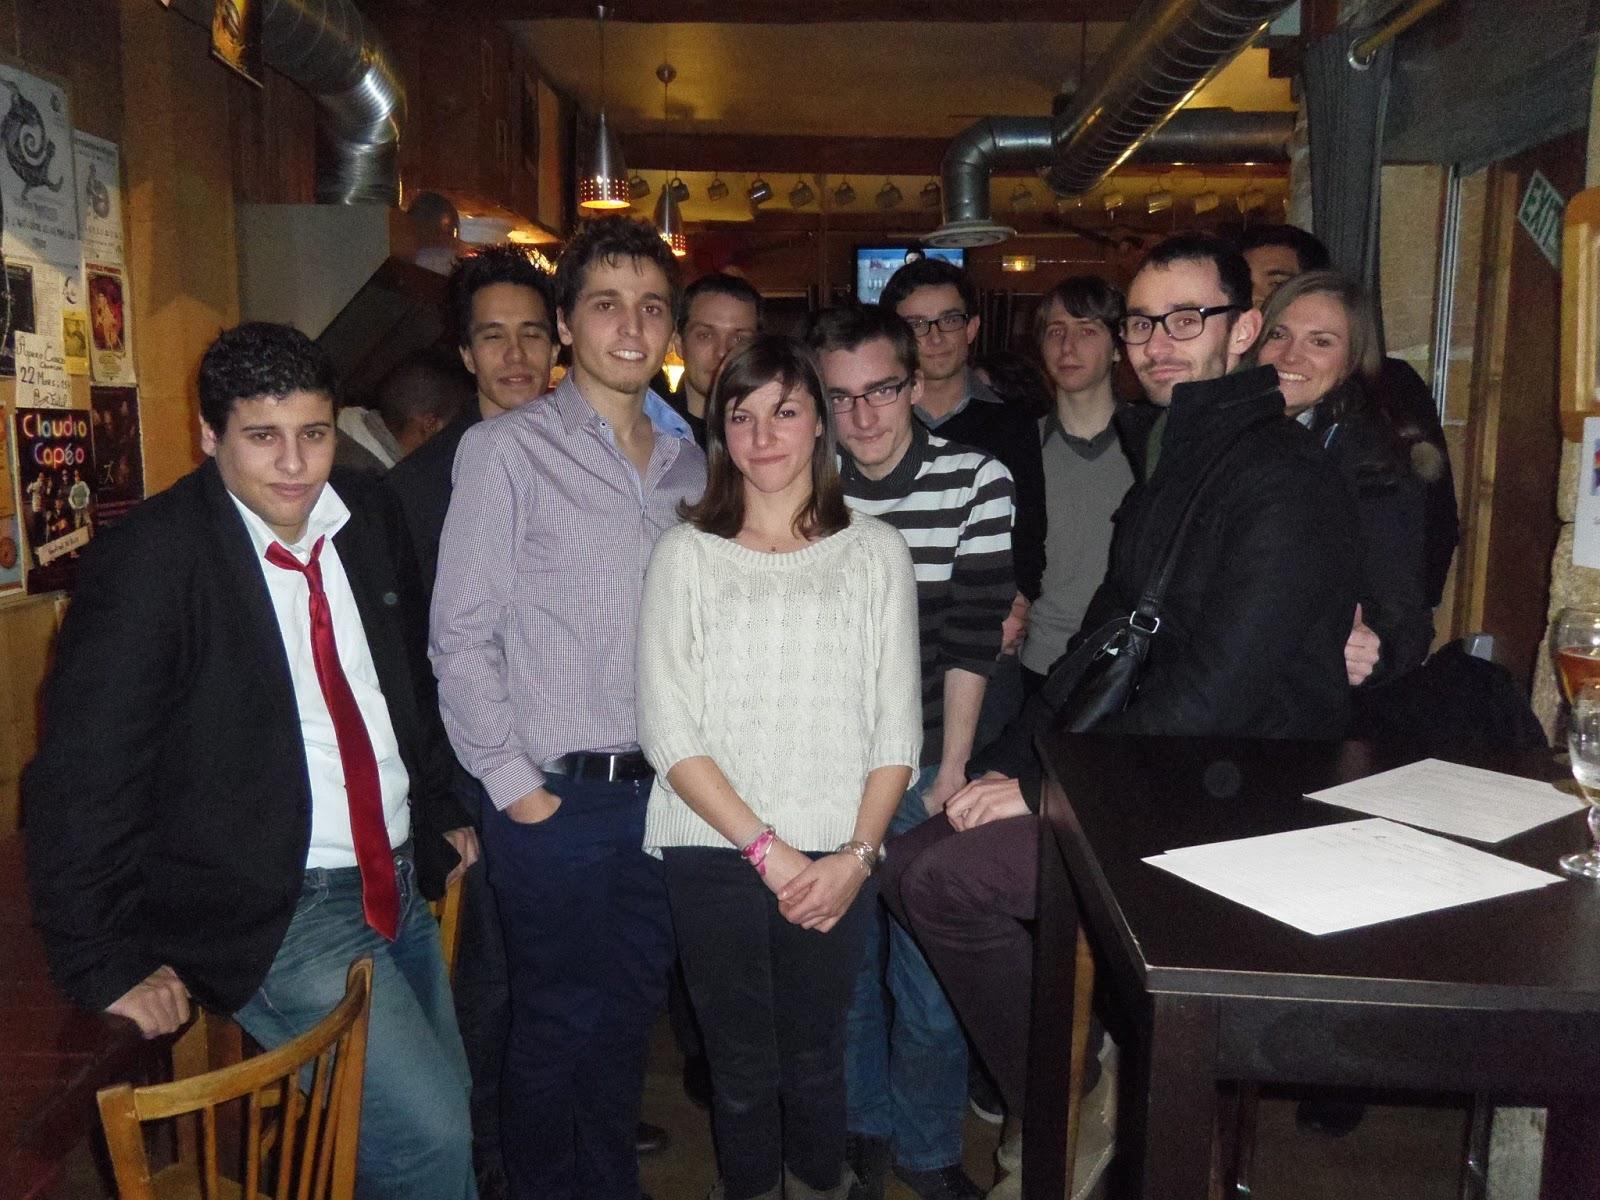 numero rencontre gay organization à Lyon